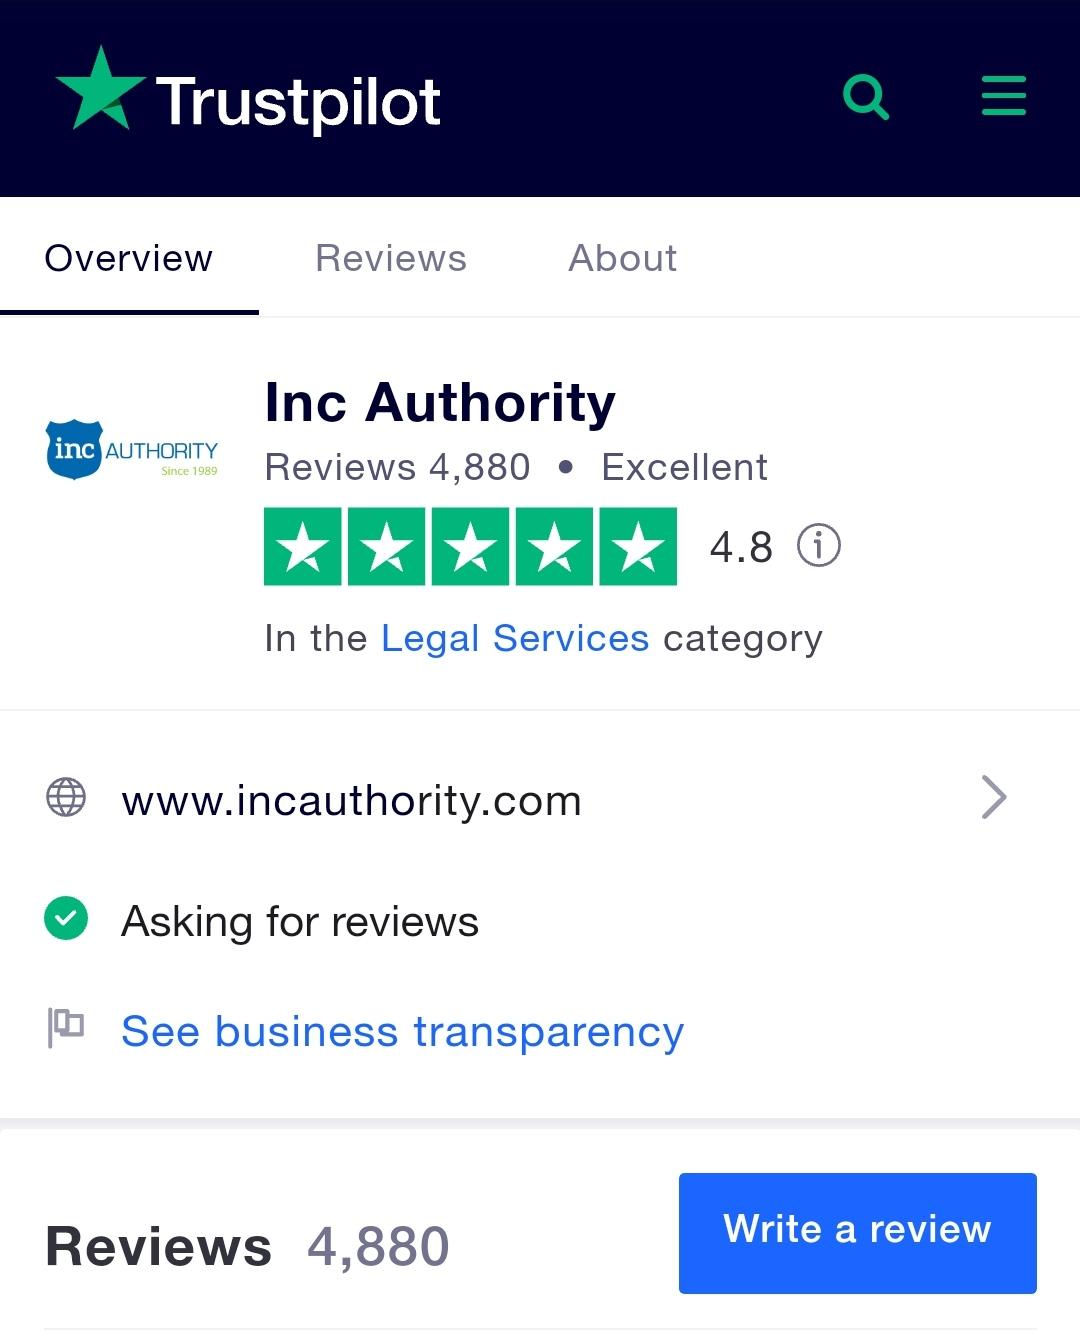 Inc Authority Trustpilot review